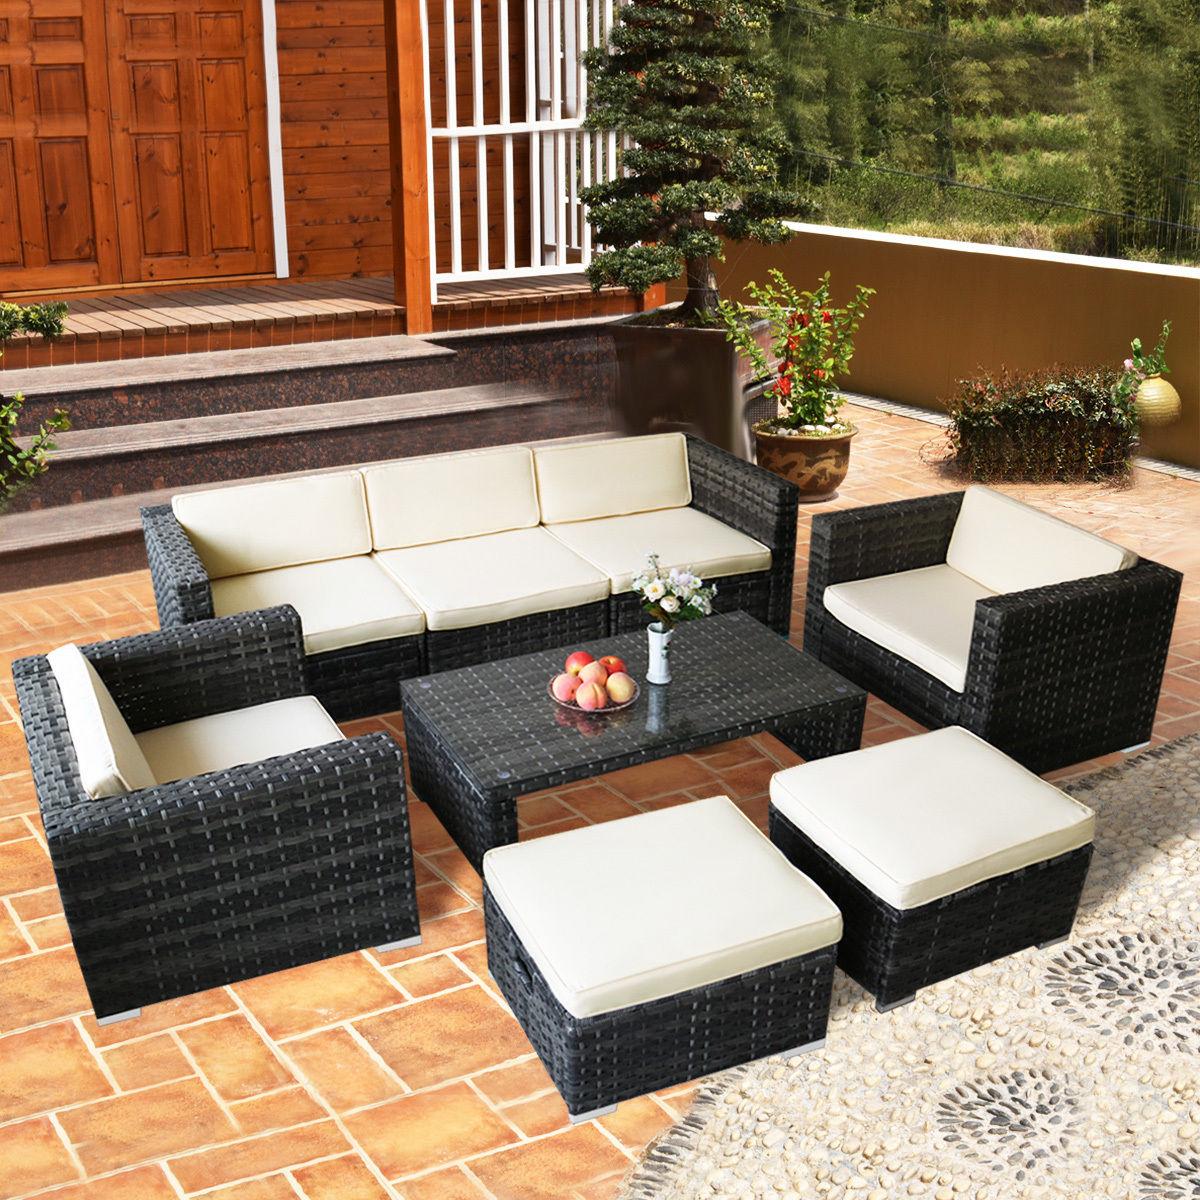 rattan patio furniture costway 8 pcs rattan wicker patio furniture set sectional cushioned ottoman FUBMWSZ